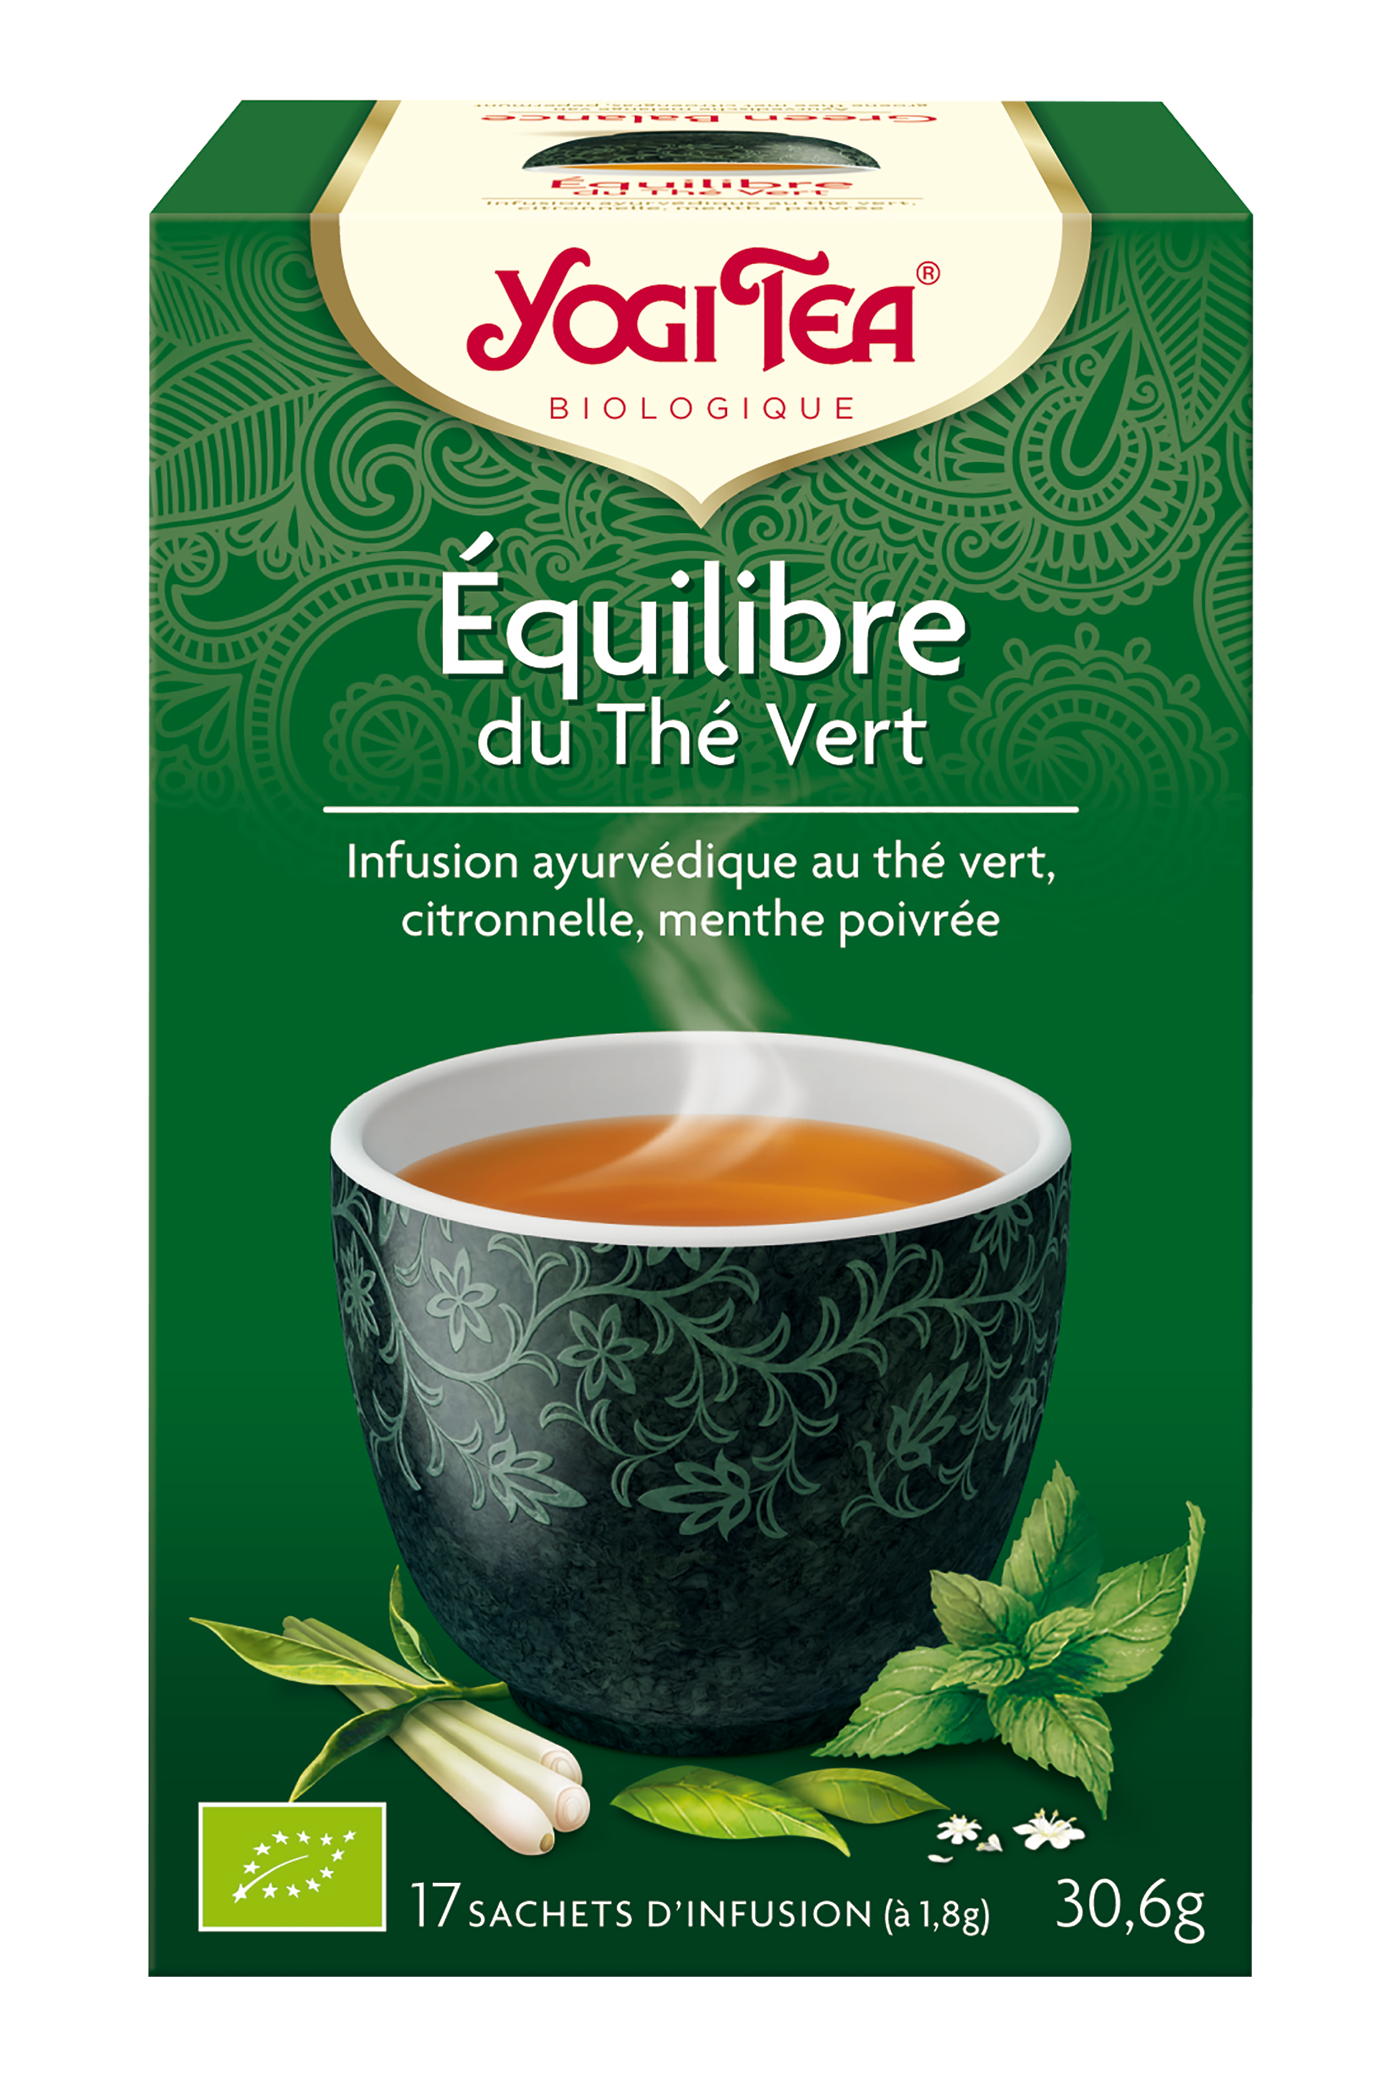 the blanc yogi tea